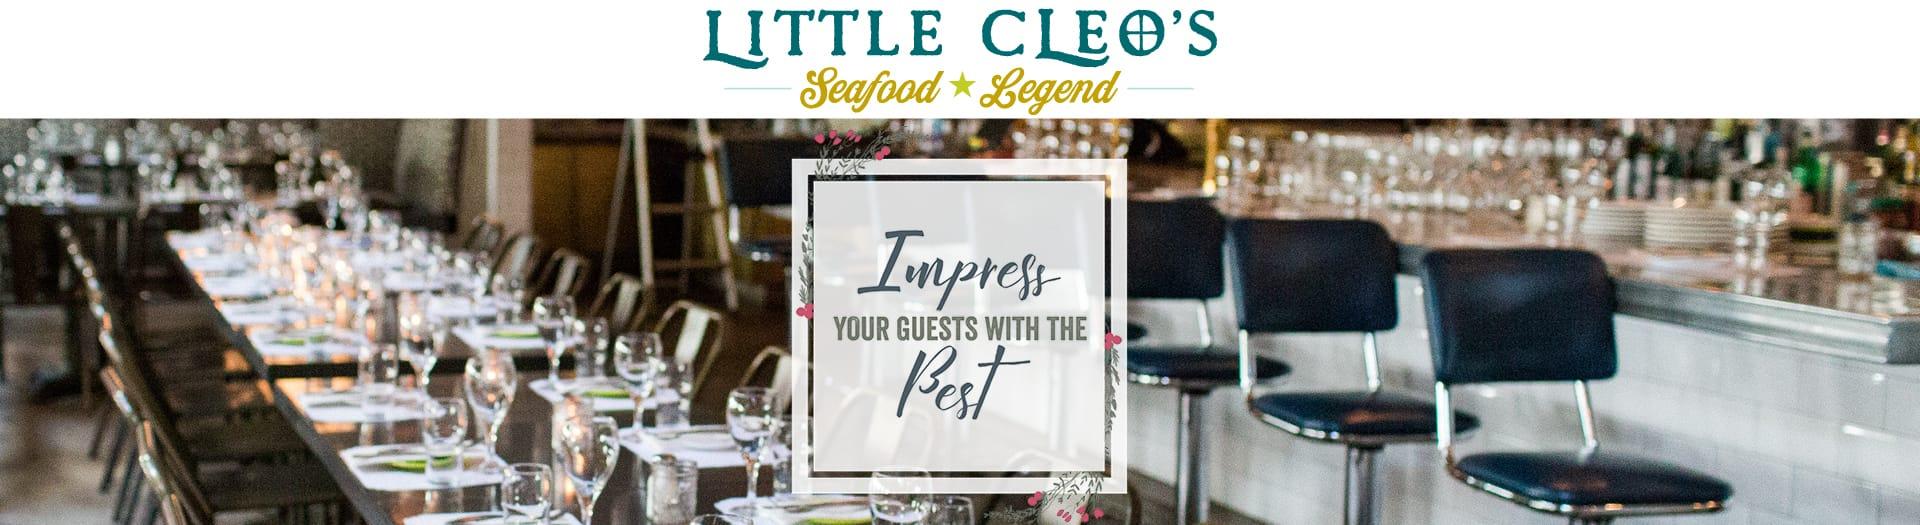 Little Cleo's Seafood Legend – Phoenix - Phoenix, AZ